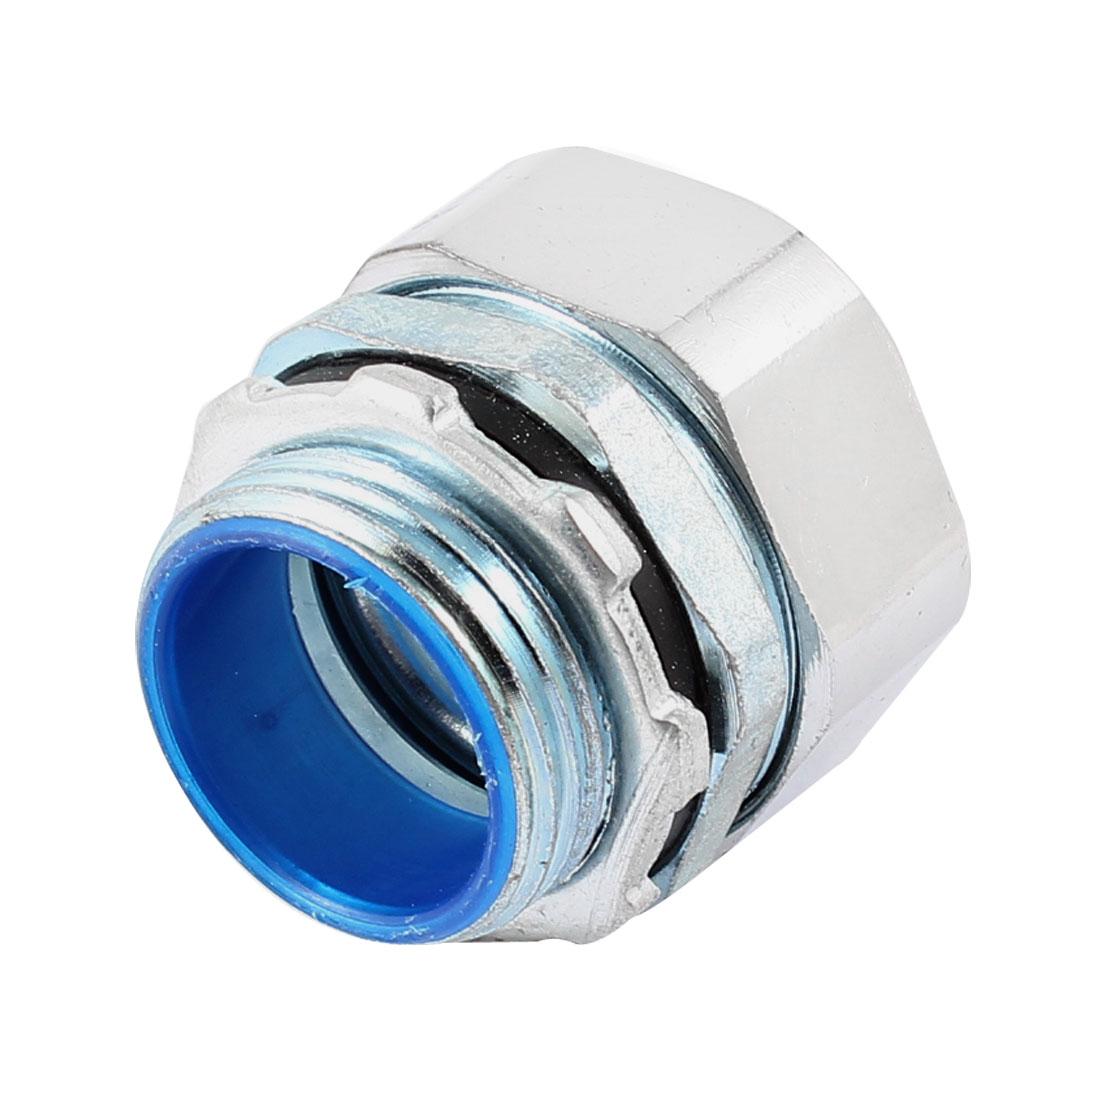 Silver Tone Metal 1 PT Male Thread Flexible Liquid Tight Connector